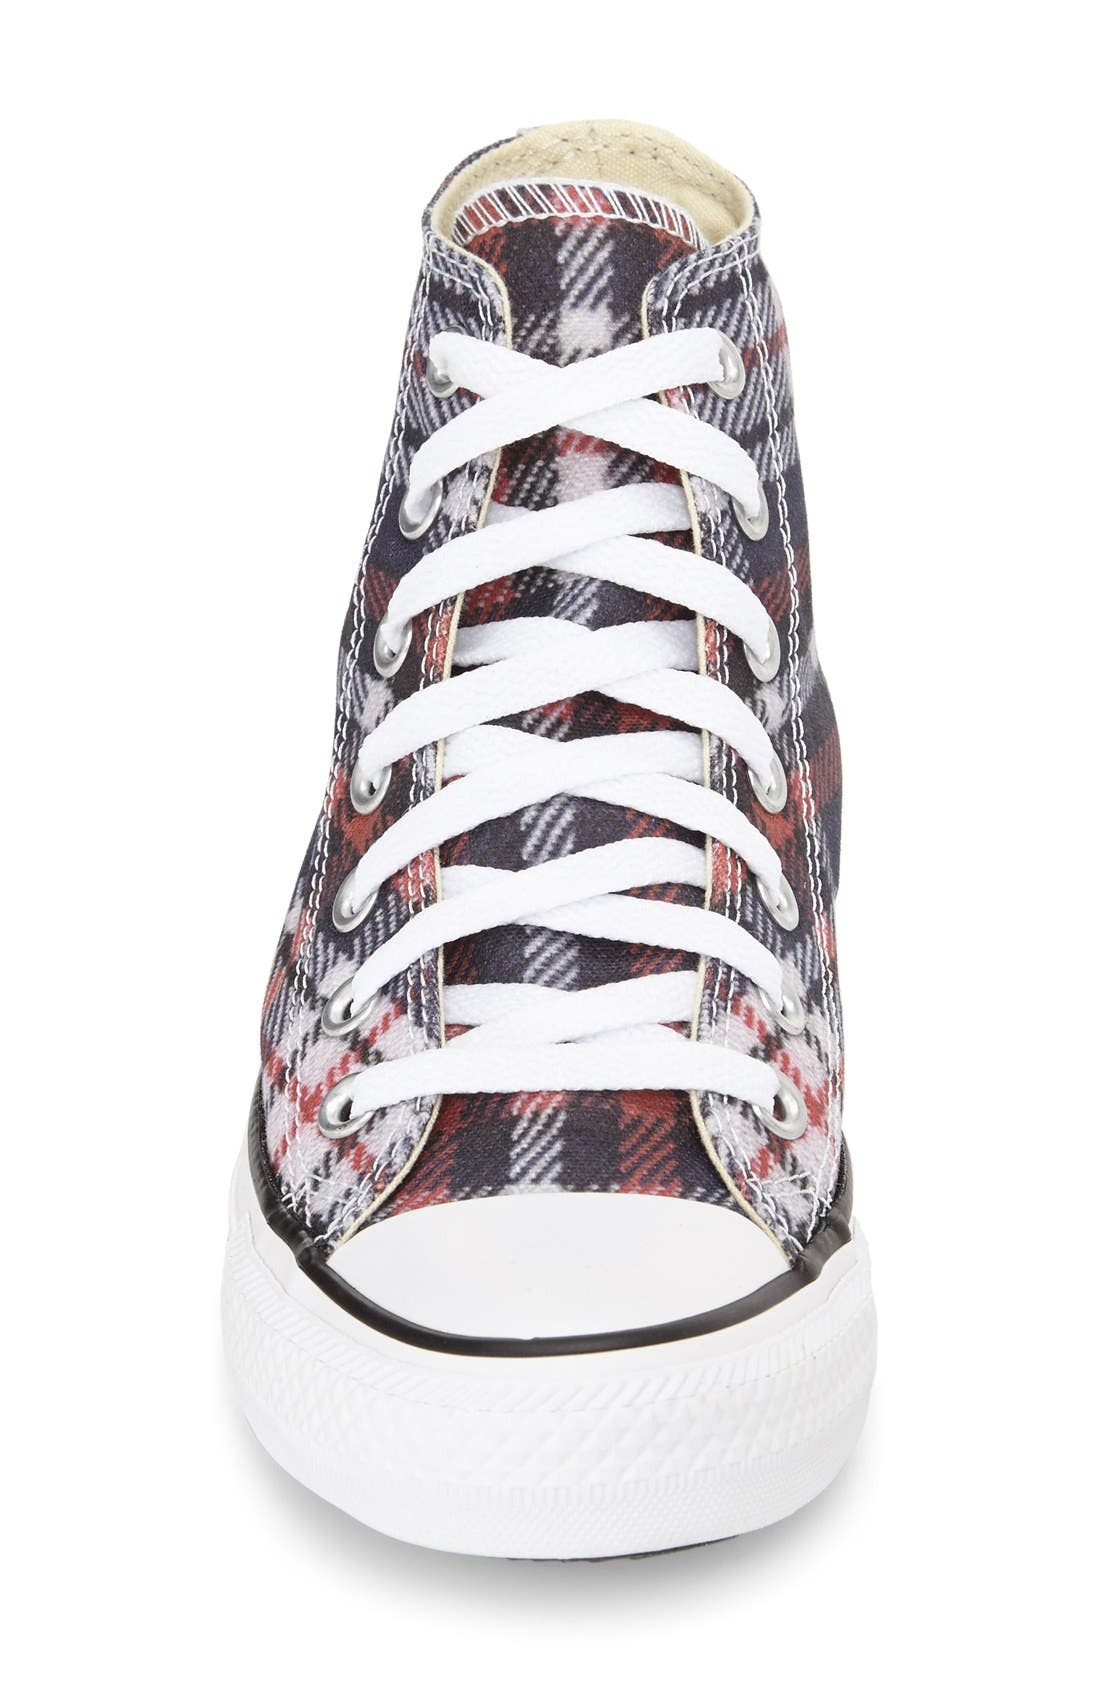 Alternate Image 3  - Converse Chuck Taylor® All Star® Plaid High Top Sneaker (Women)